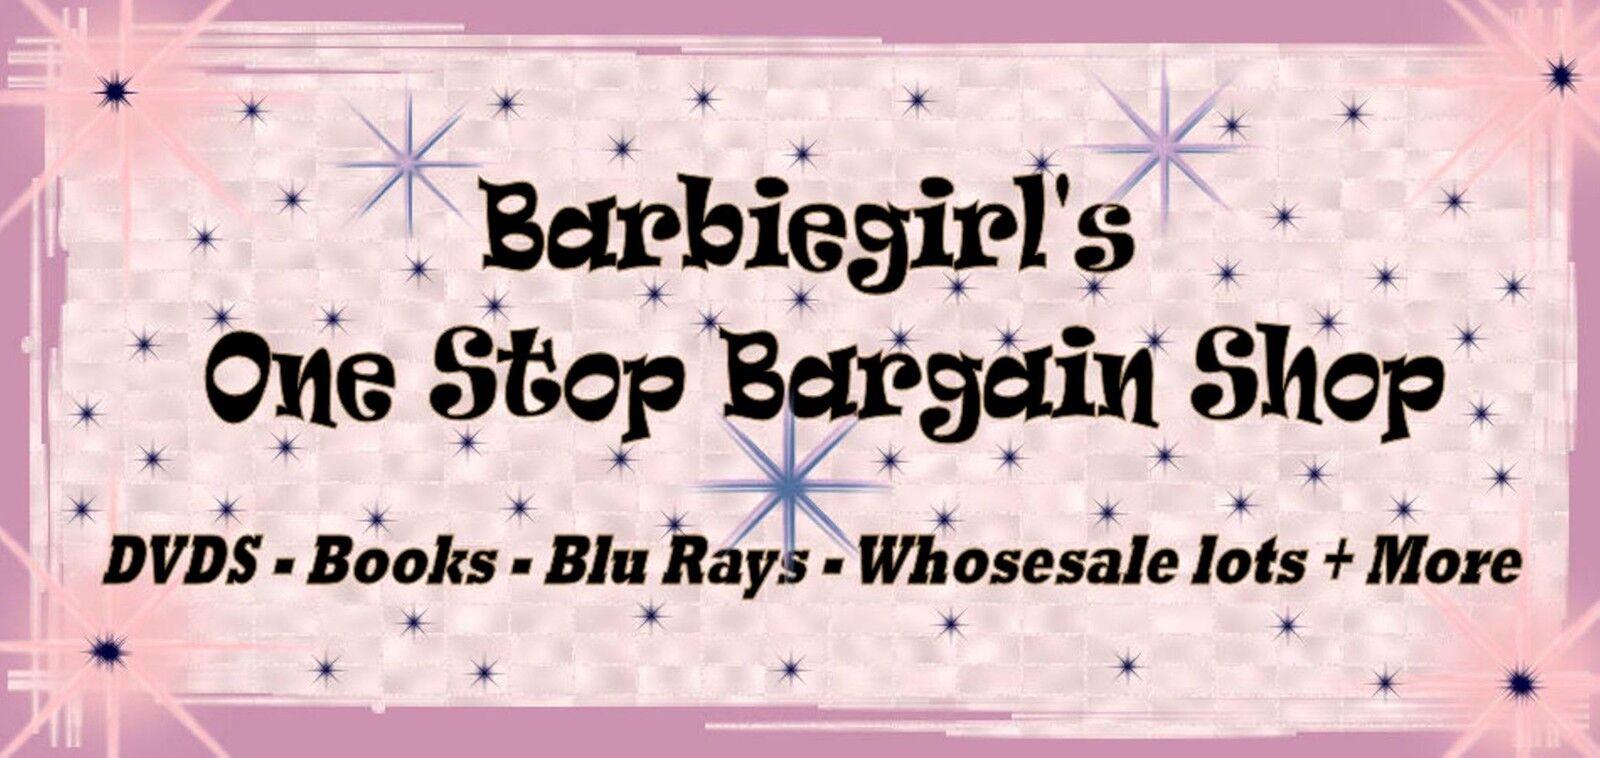 barbiegirl s One Stop Bargain Shop